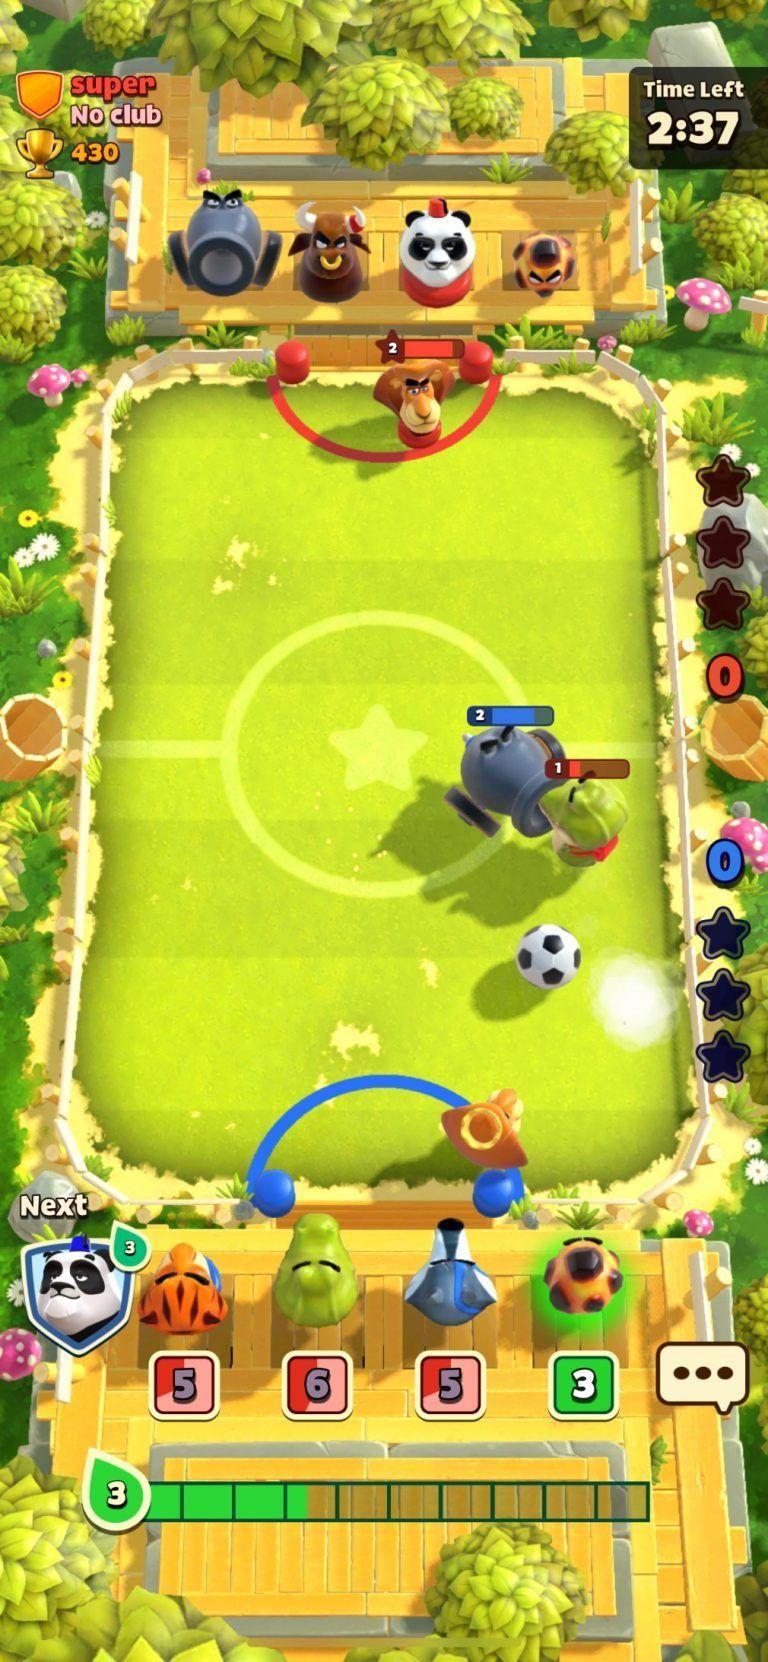 Futebol Rumble Stars Futebol multiplayer explosivo com